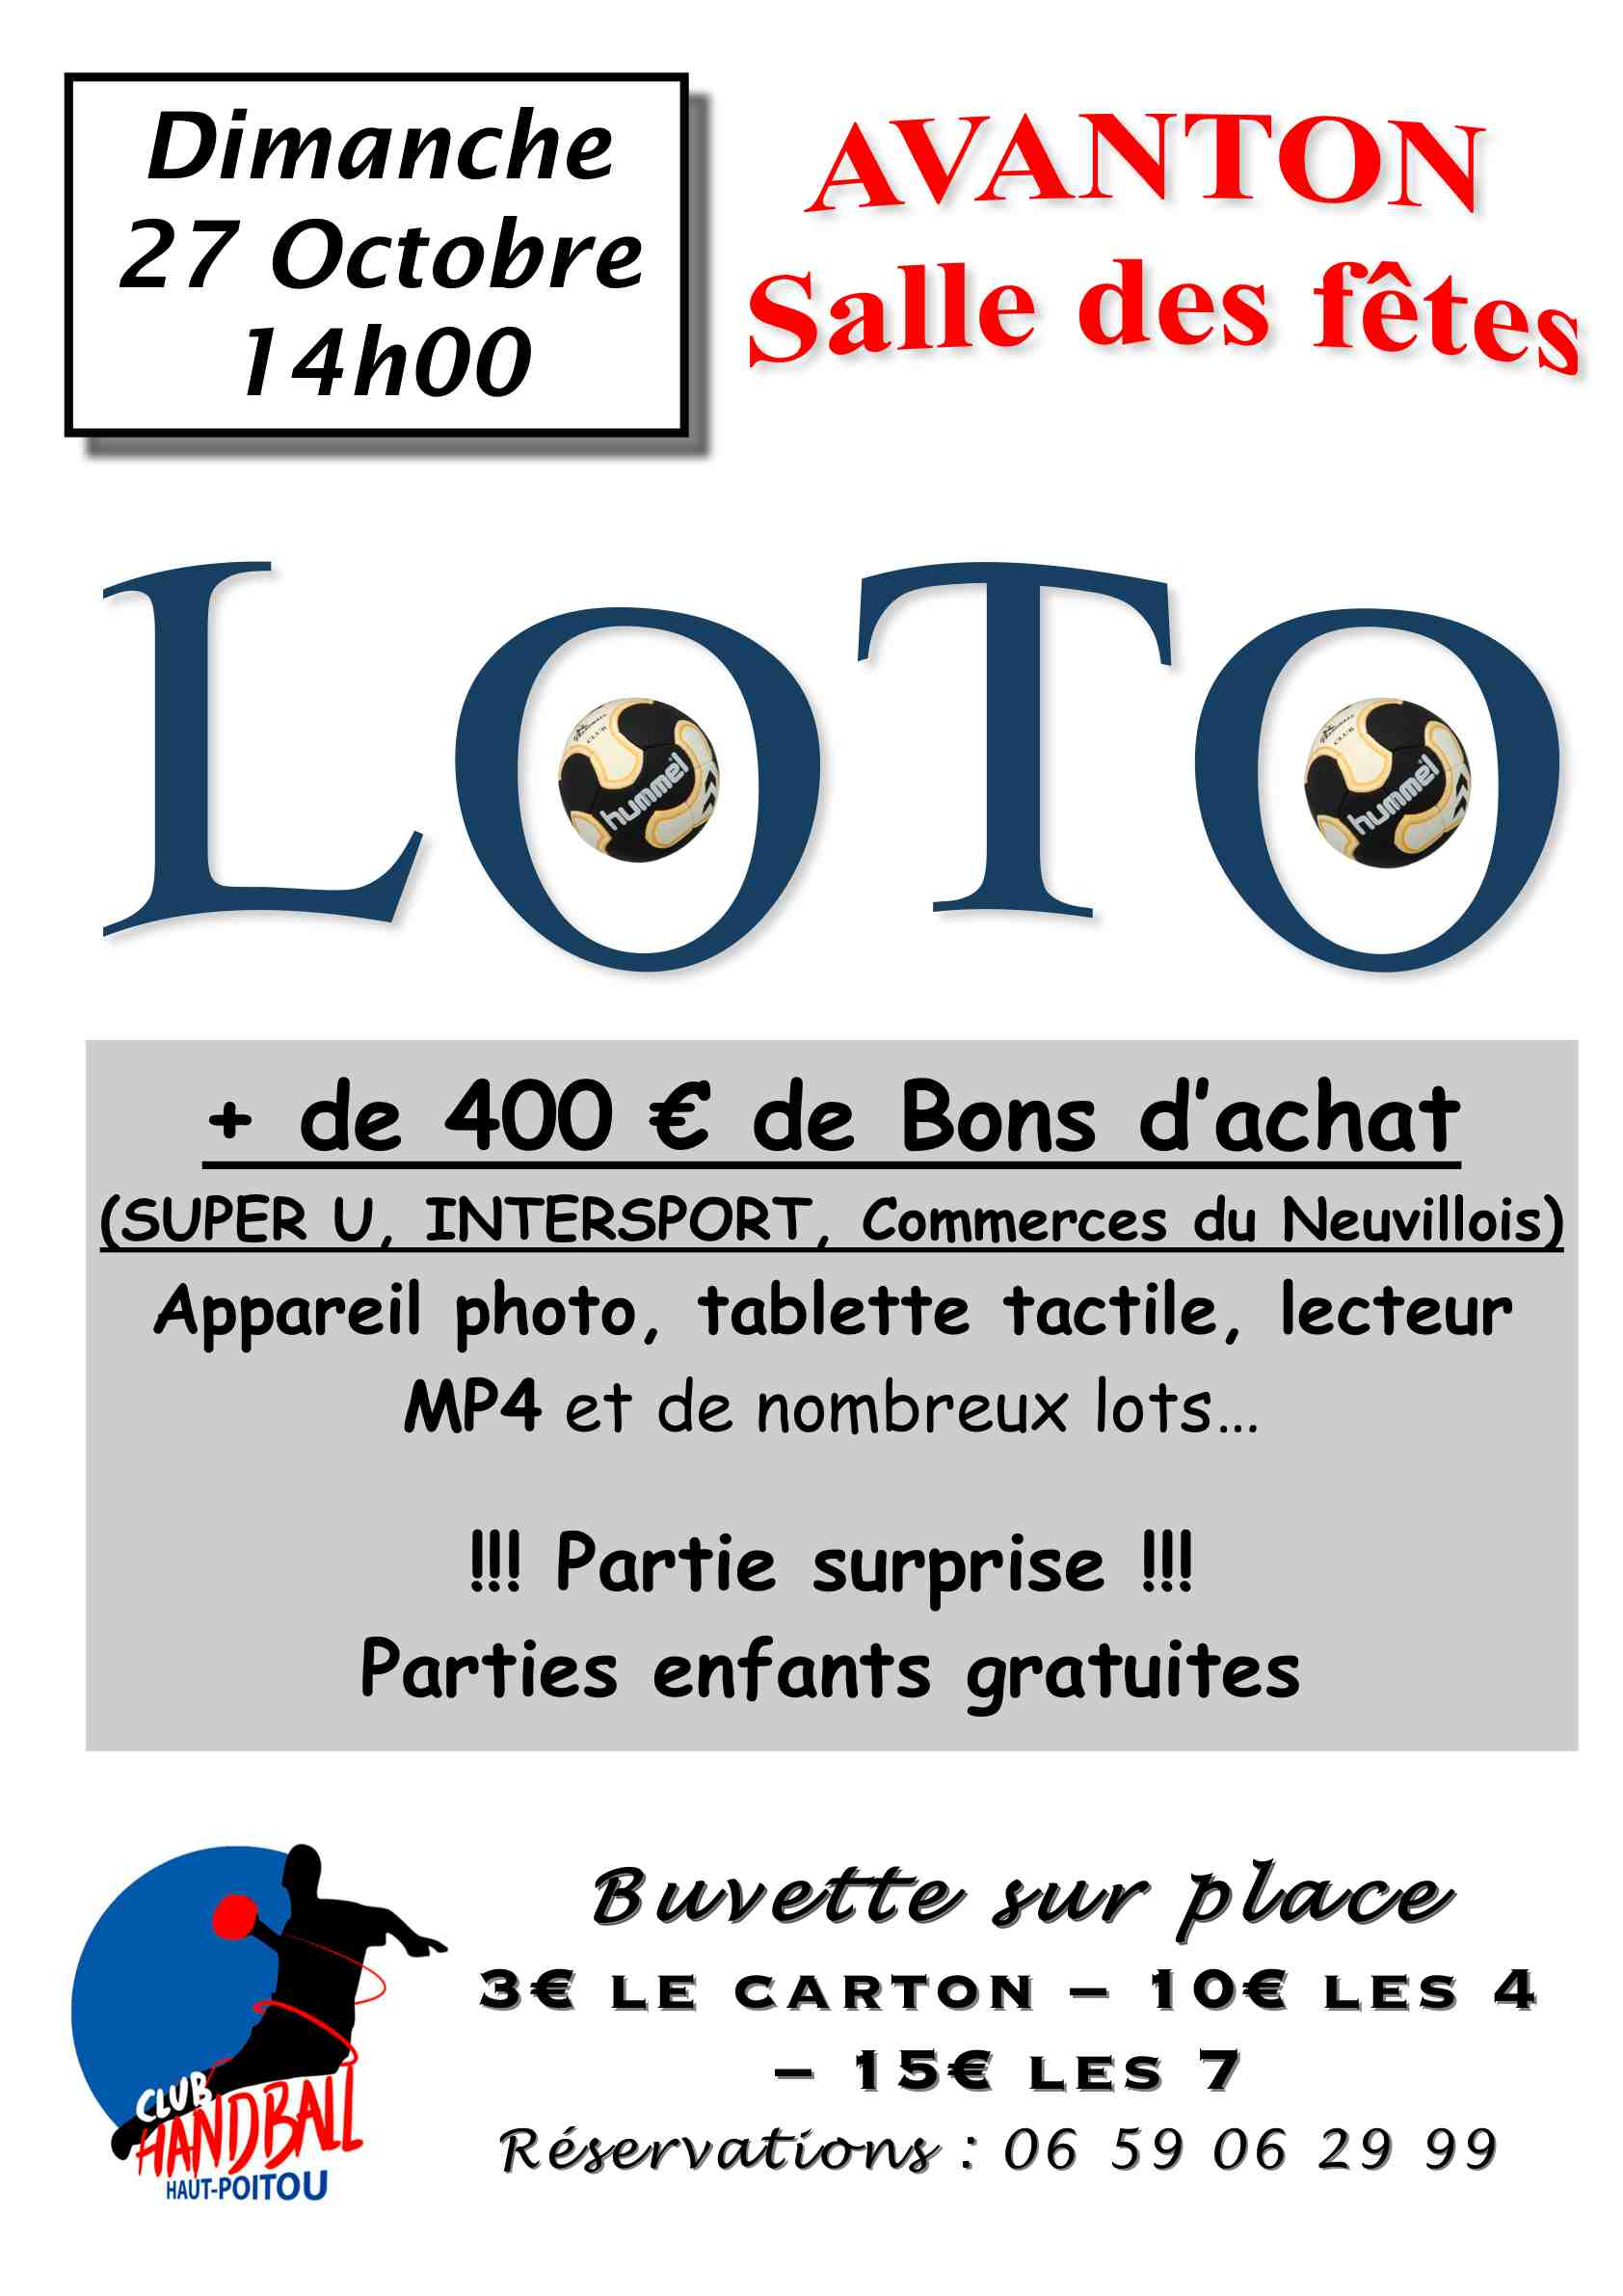 Affiche loto Avanton 27-10-2013